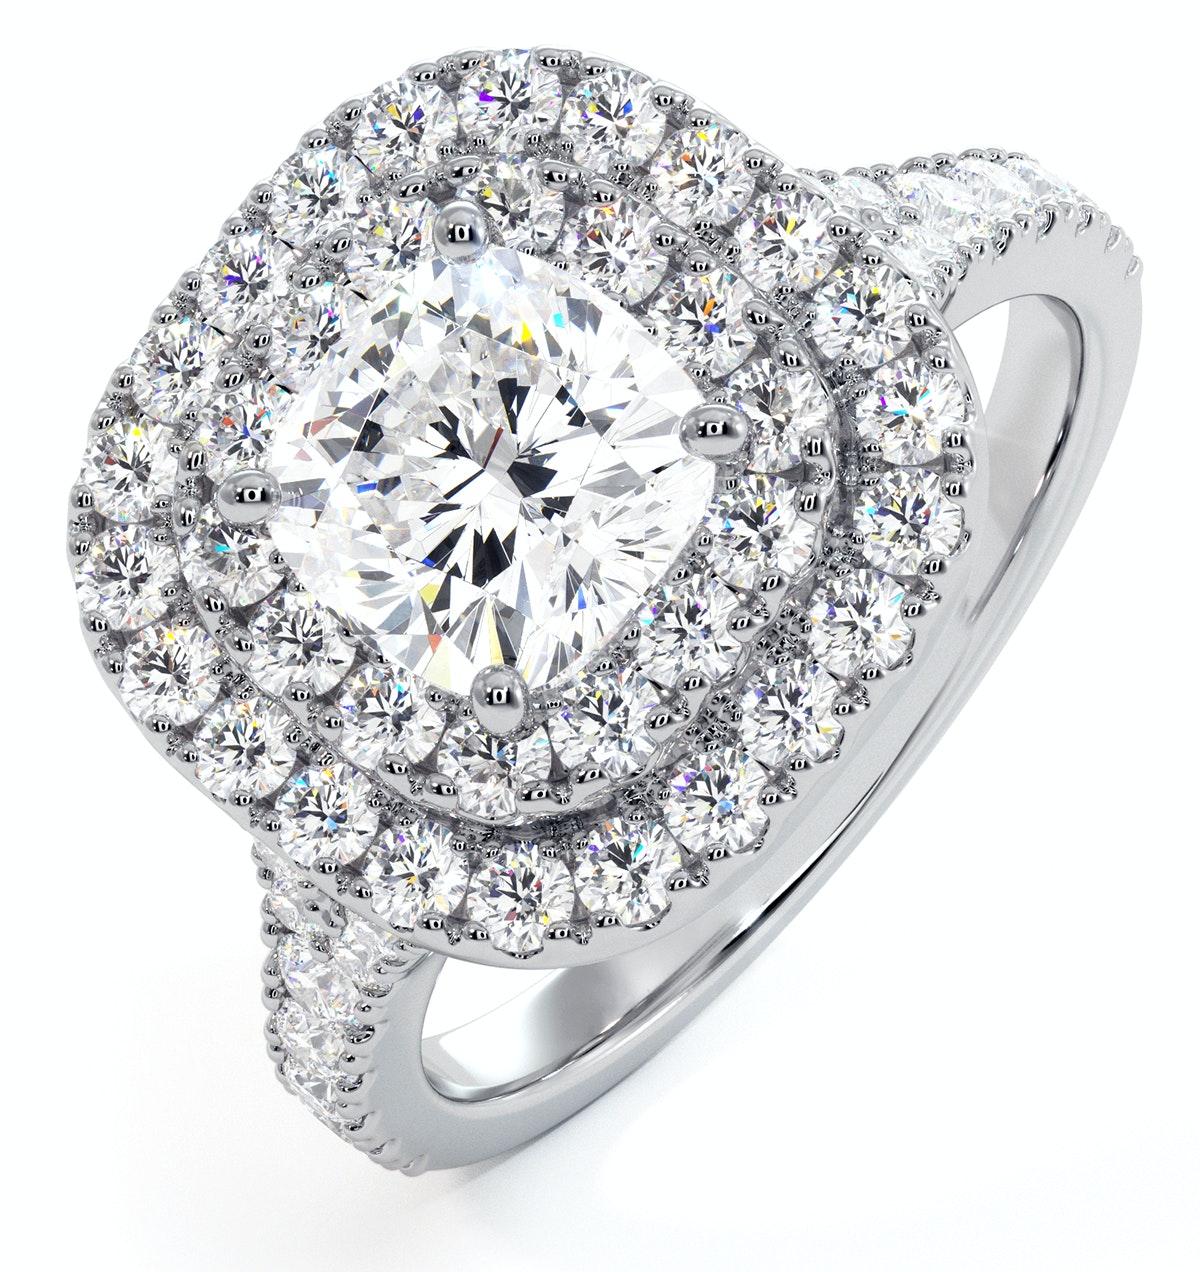 Anastasia GIA Diamond Halo Engagement Ring in Platinum 1.70ct G/VS2